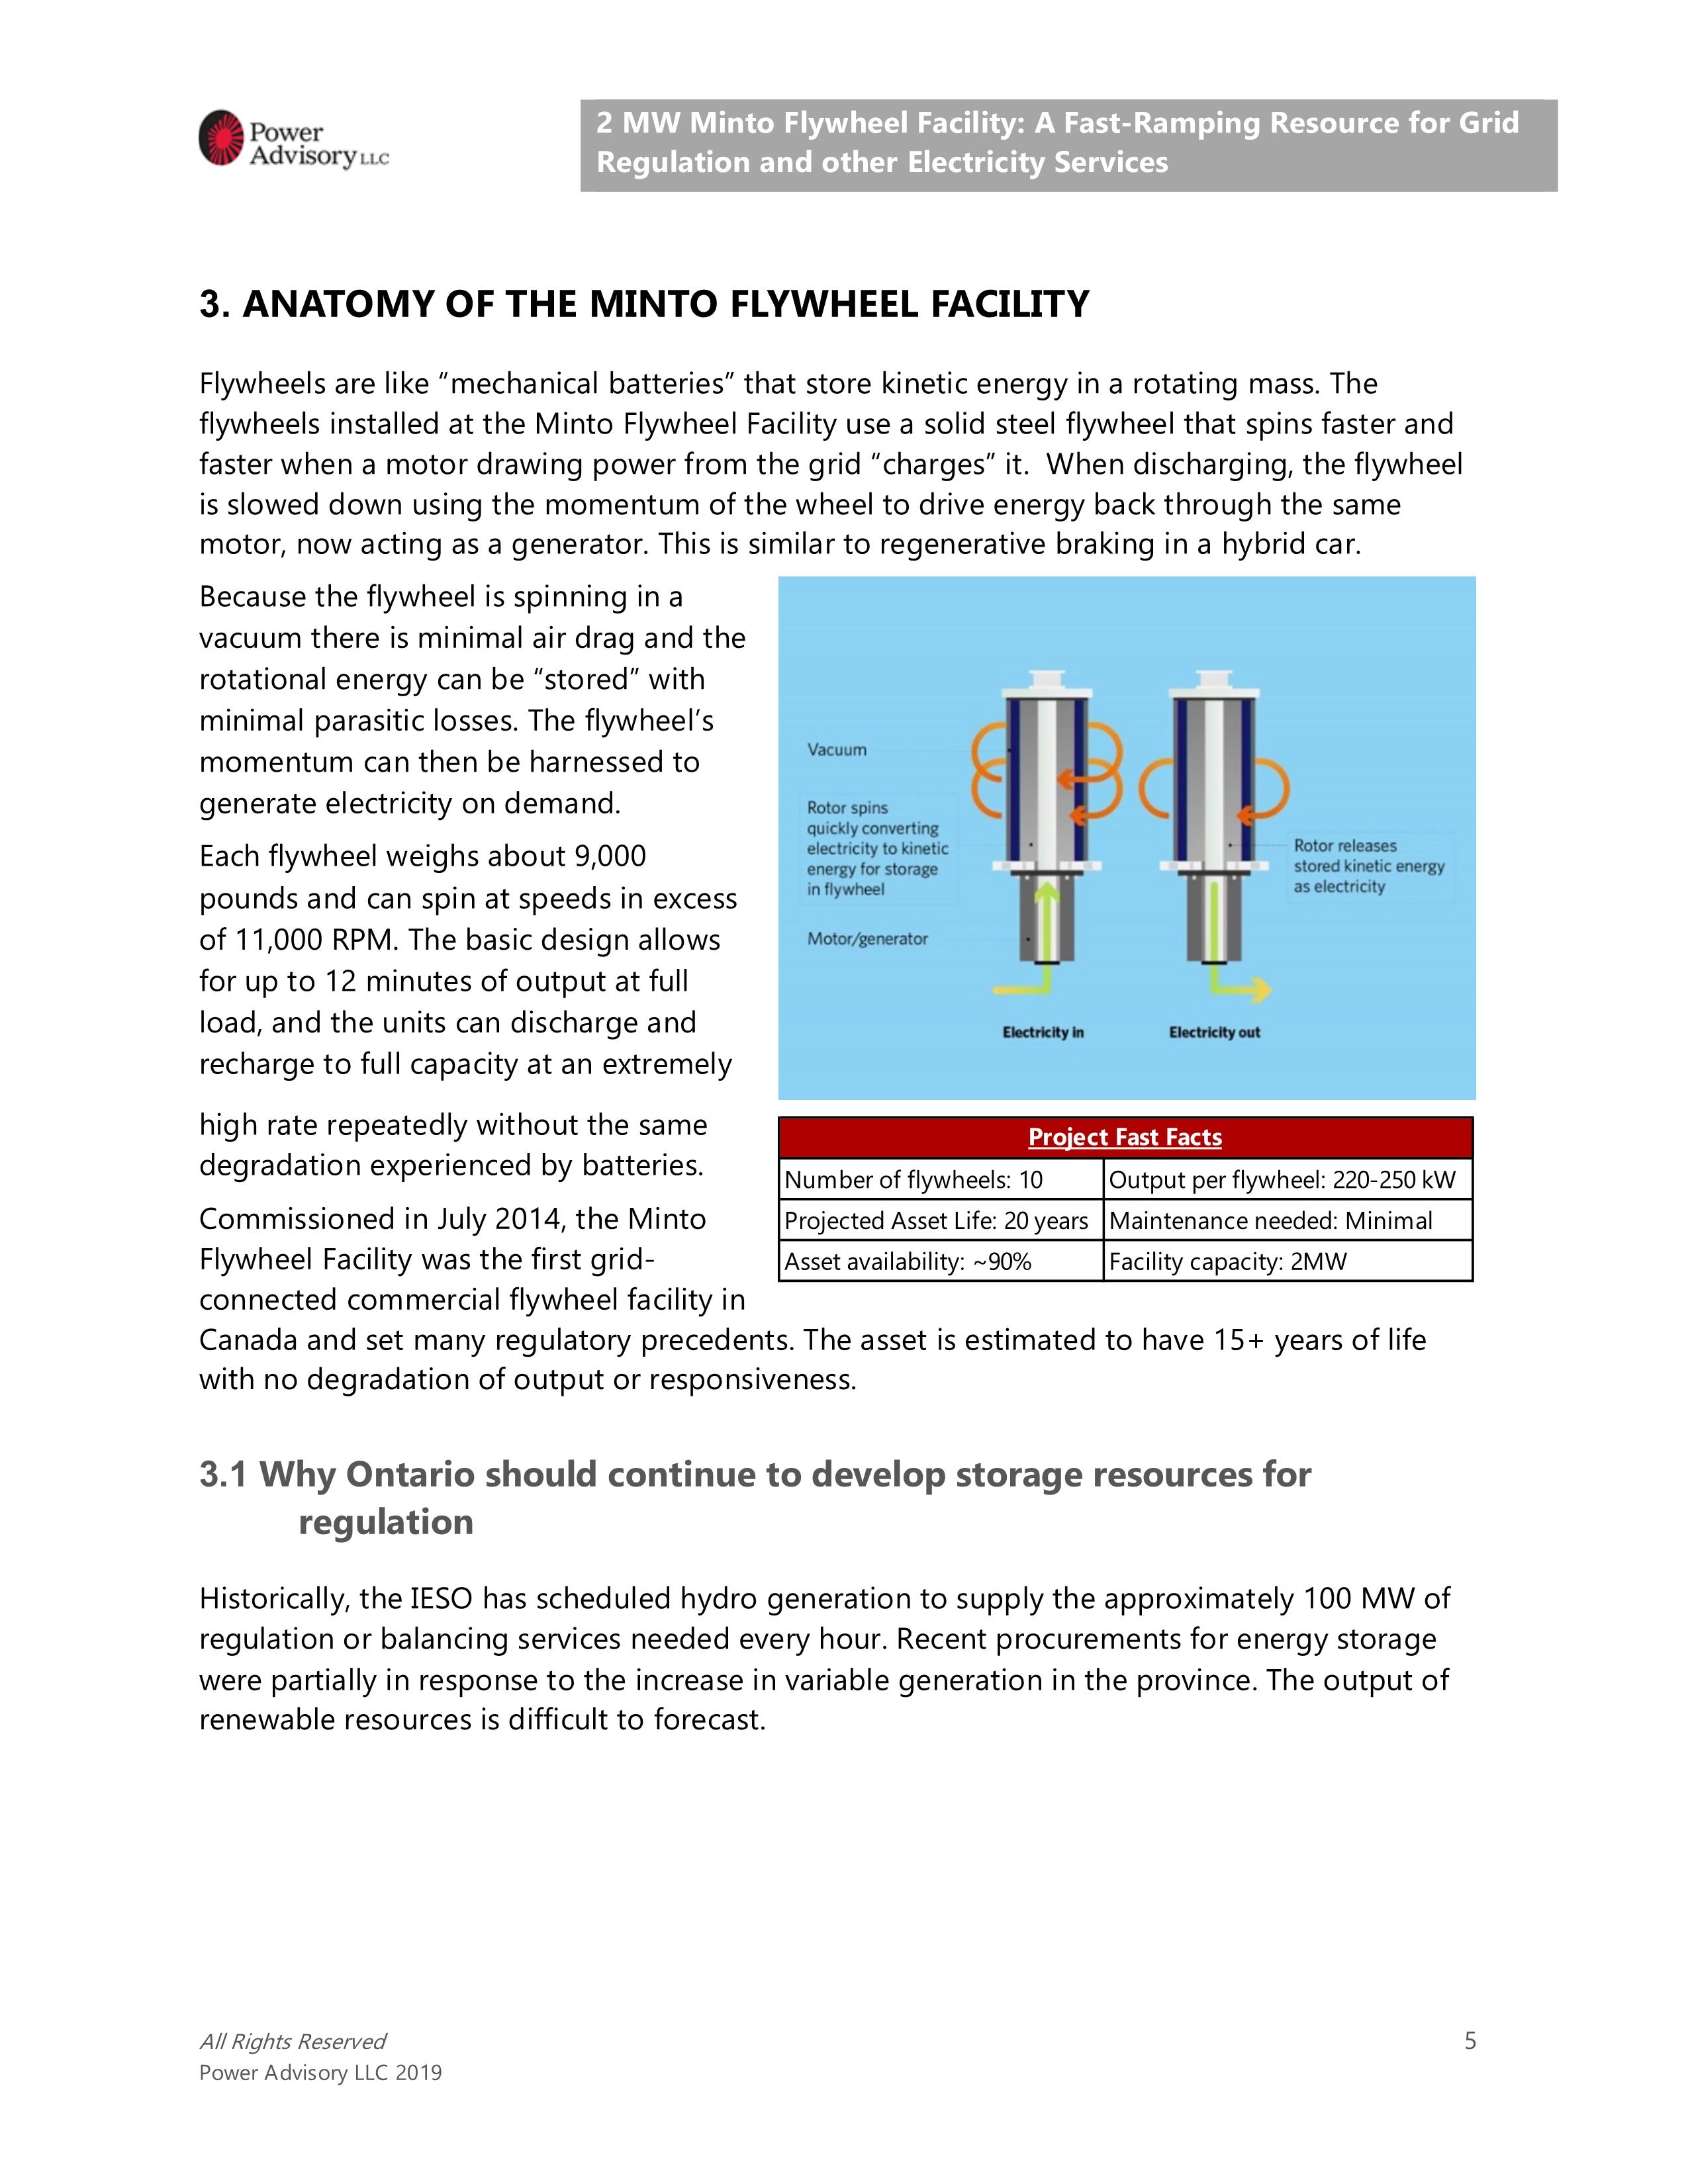 2-MW-Minto-Flywheel-Facility-Case-Study-2-1_4.jpg